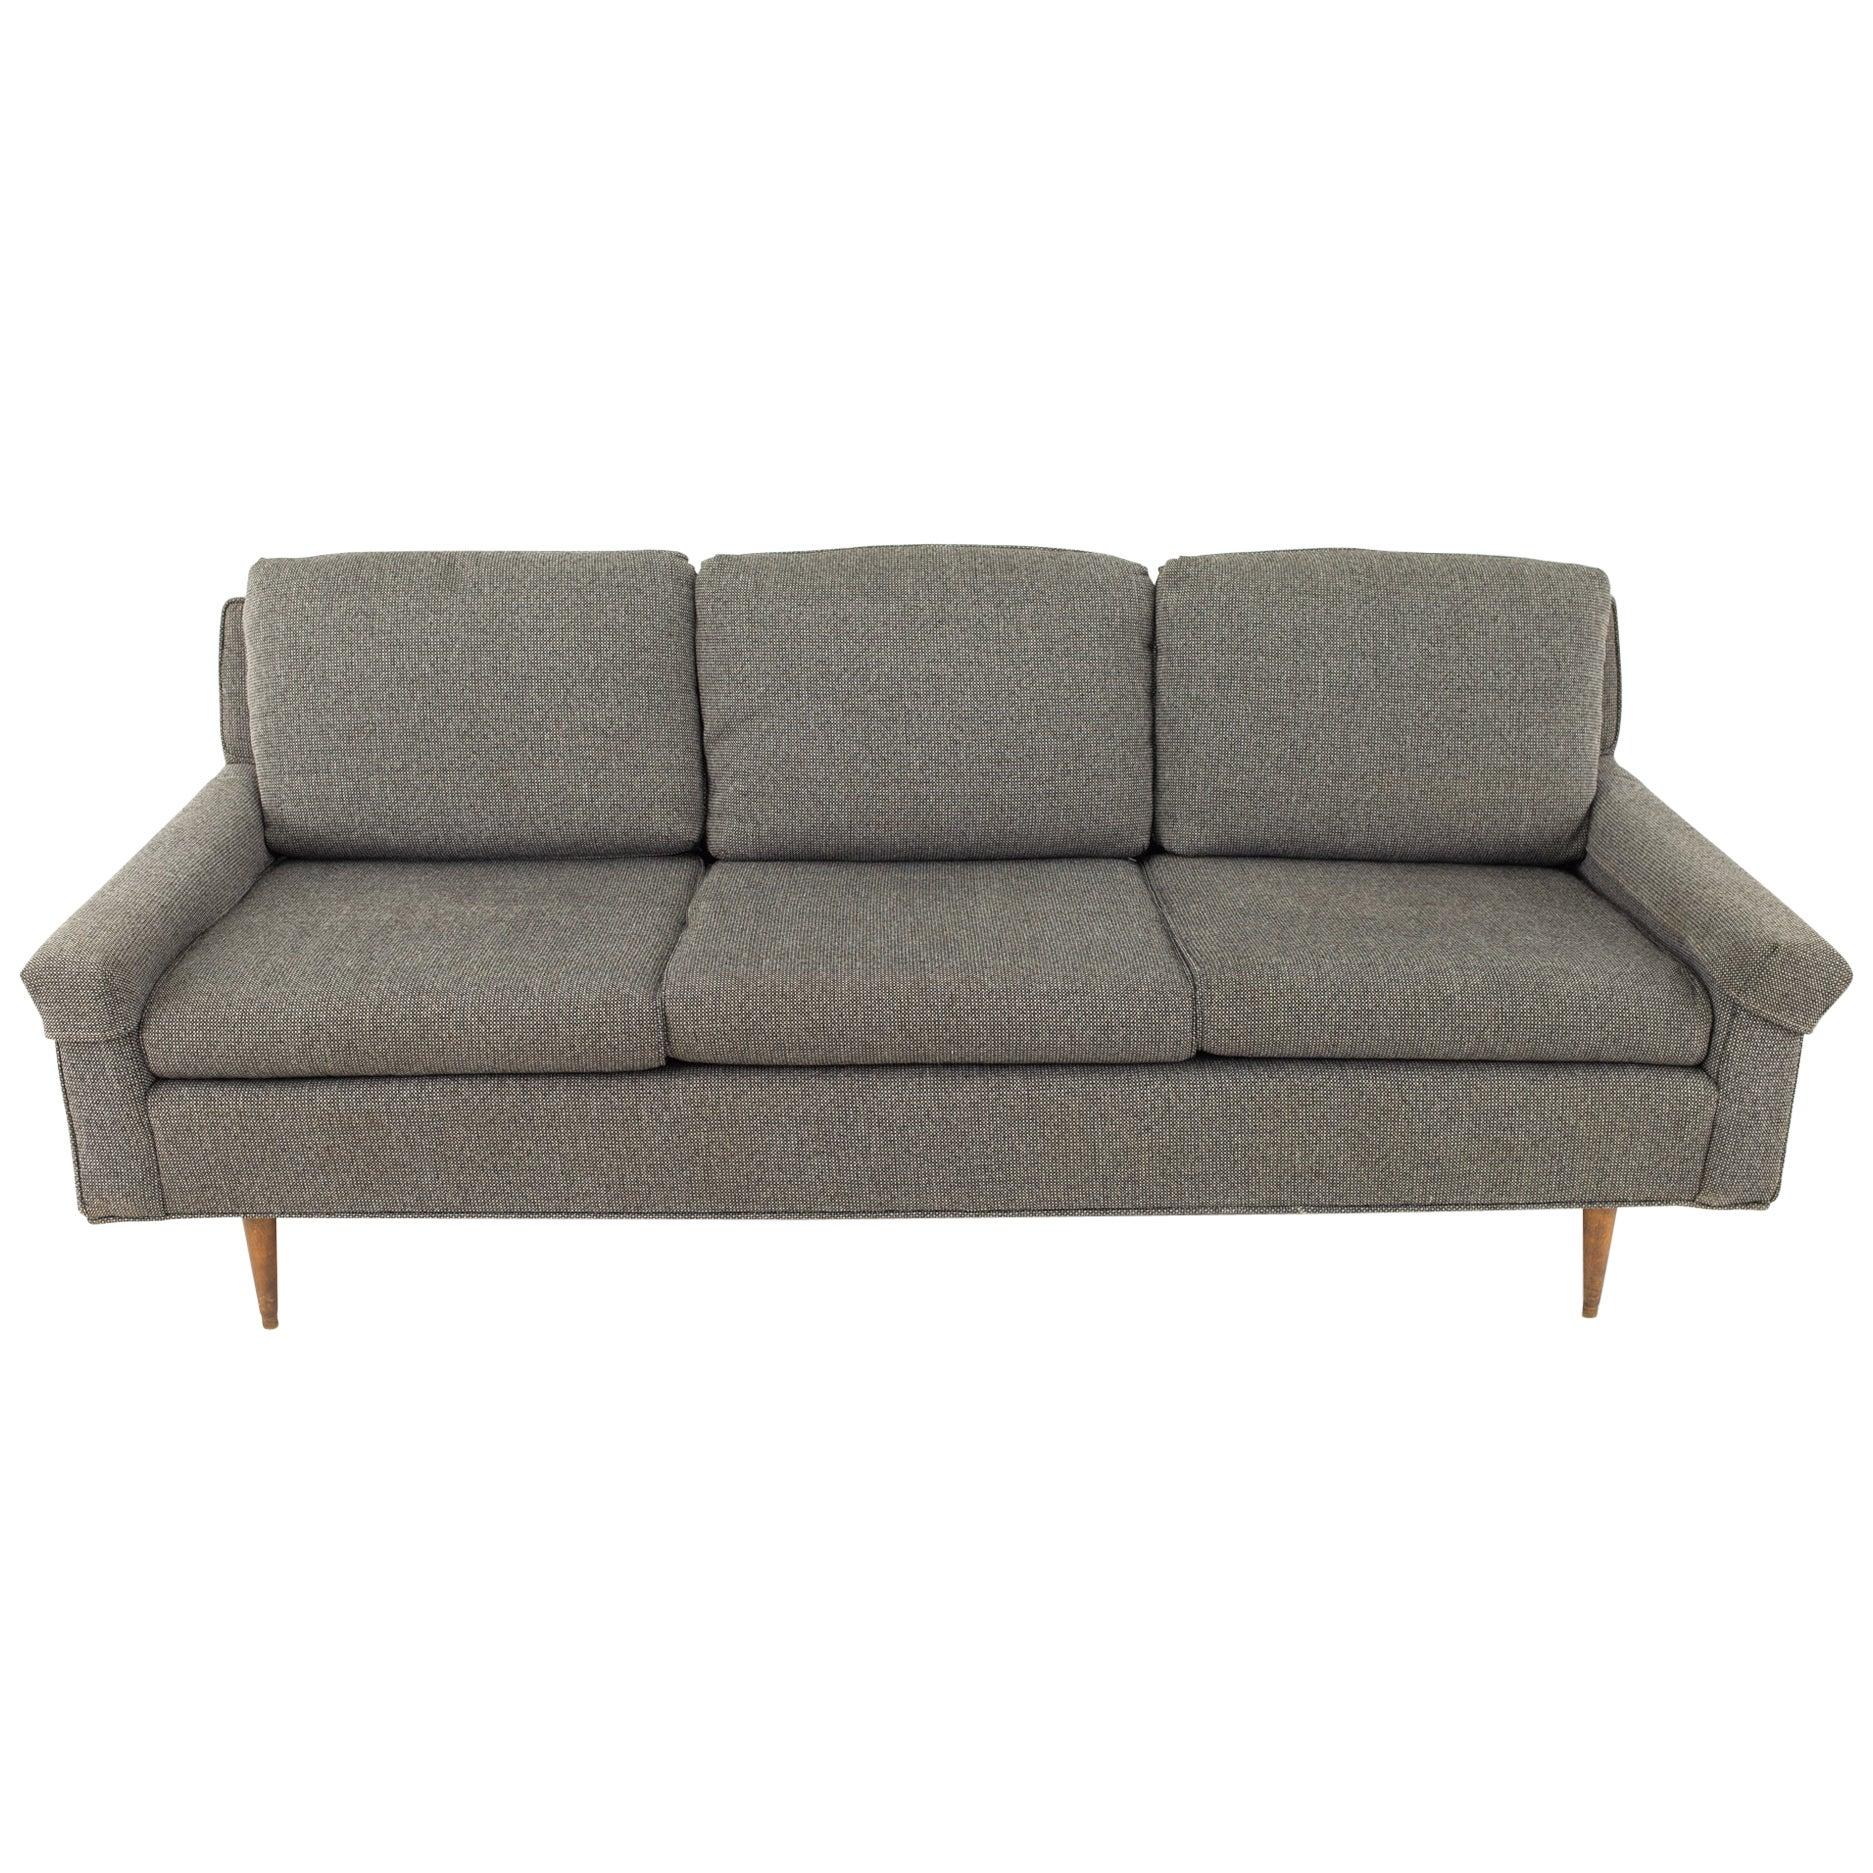 Milo Baughman Style Mid Century Custom Sofa